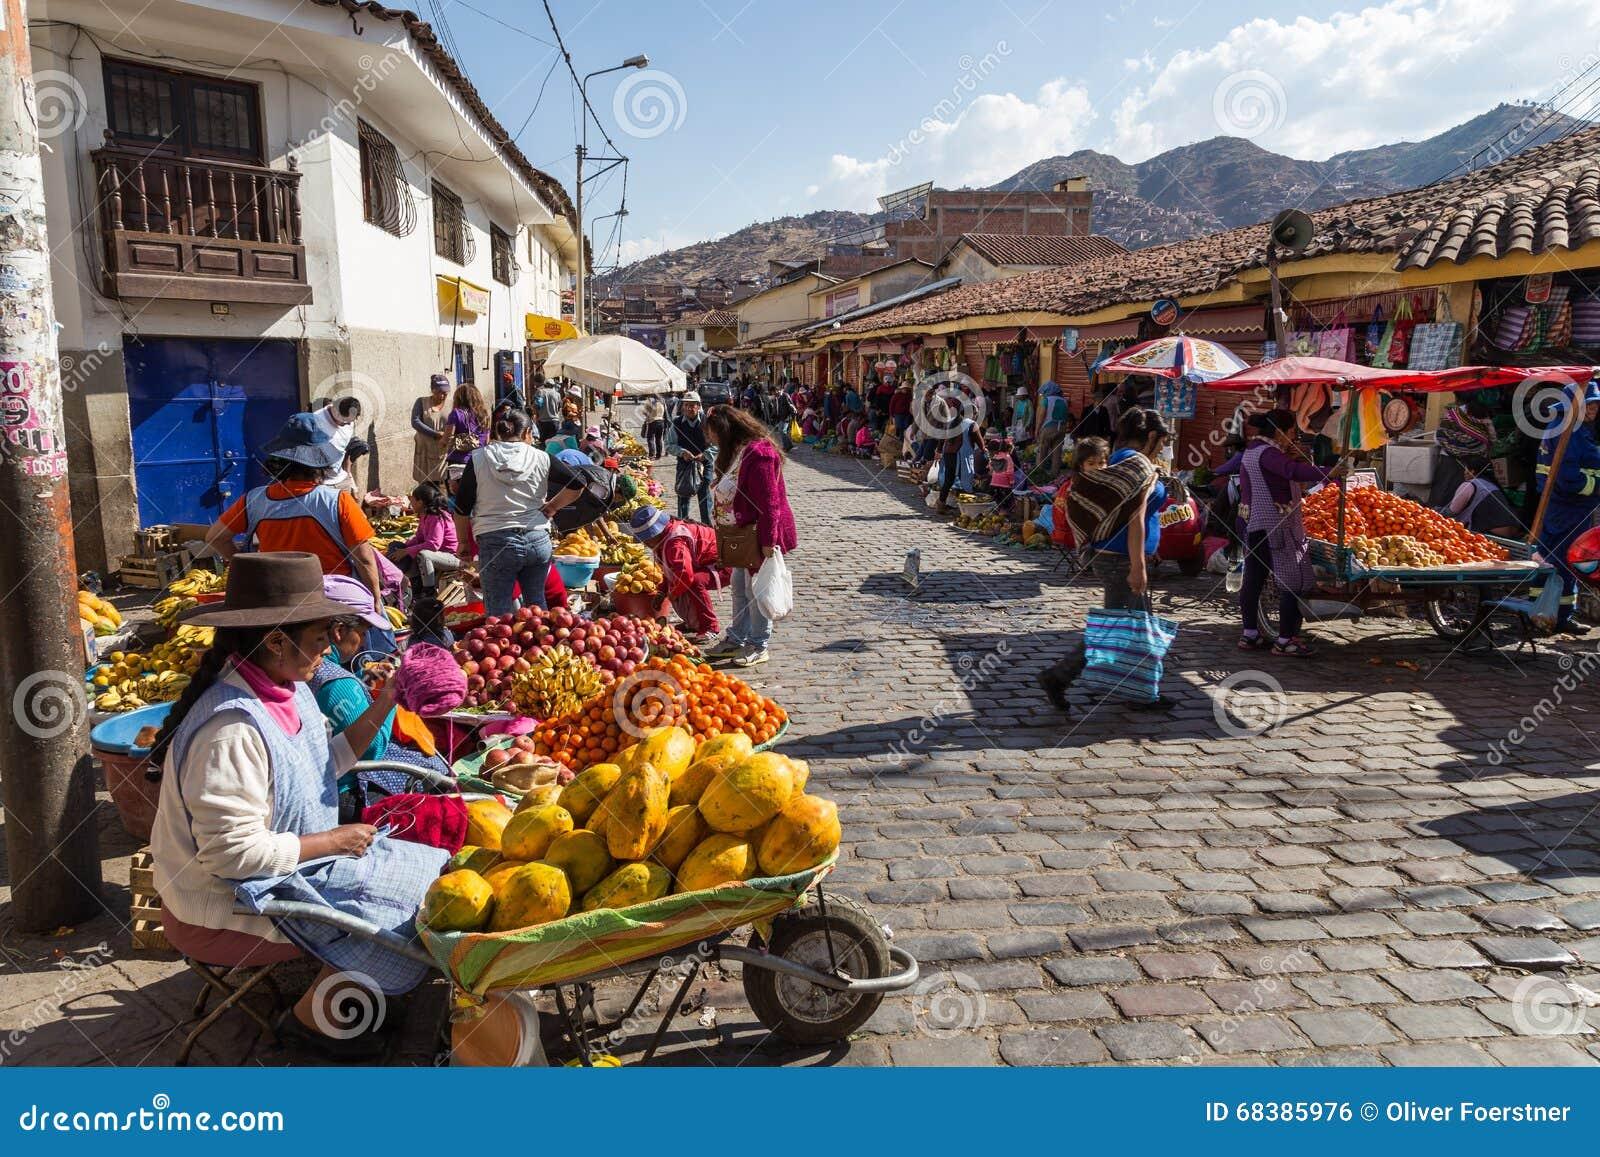 Fruit market in the steets of Cusco, Peru